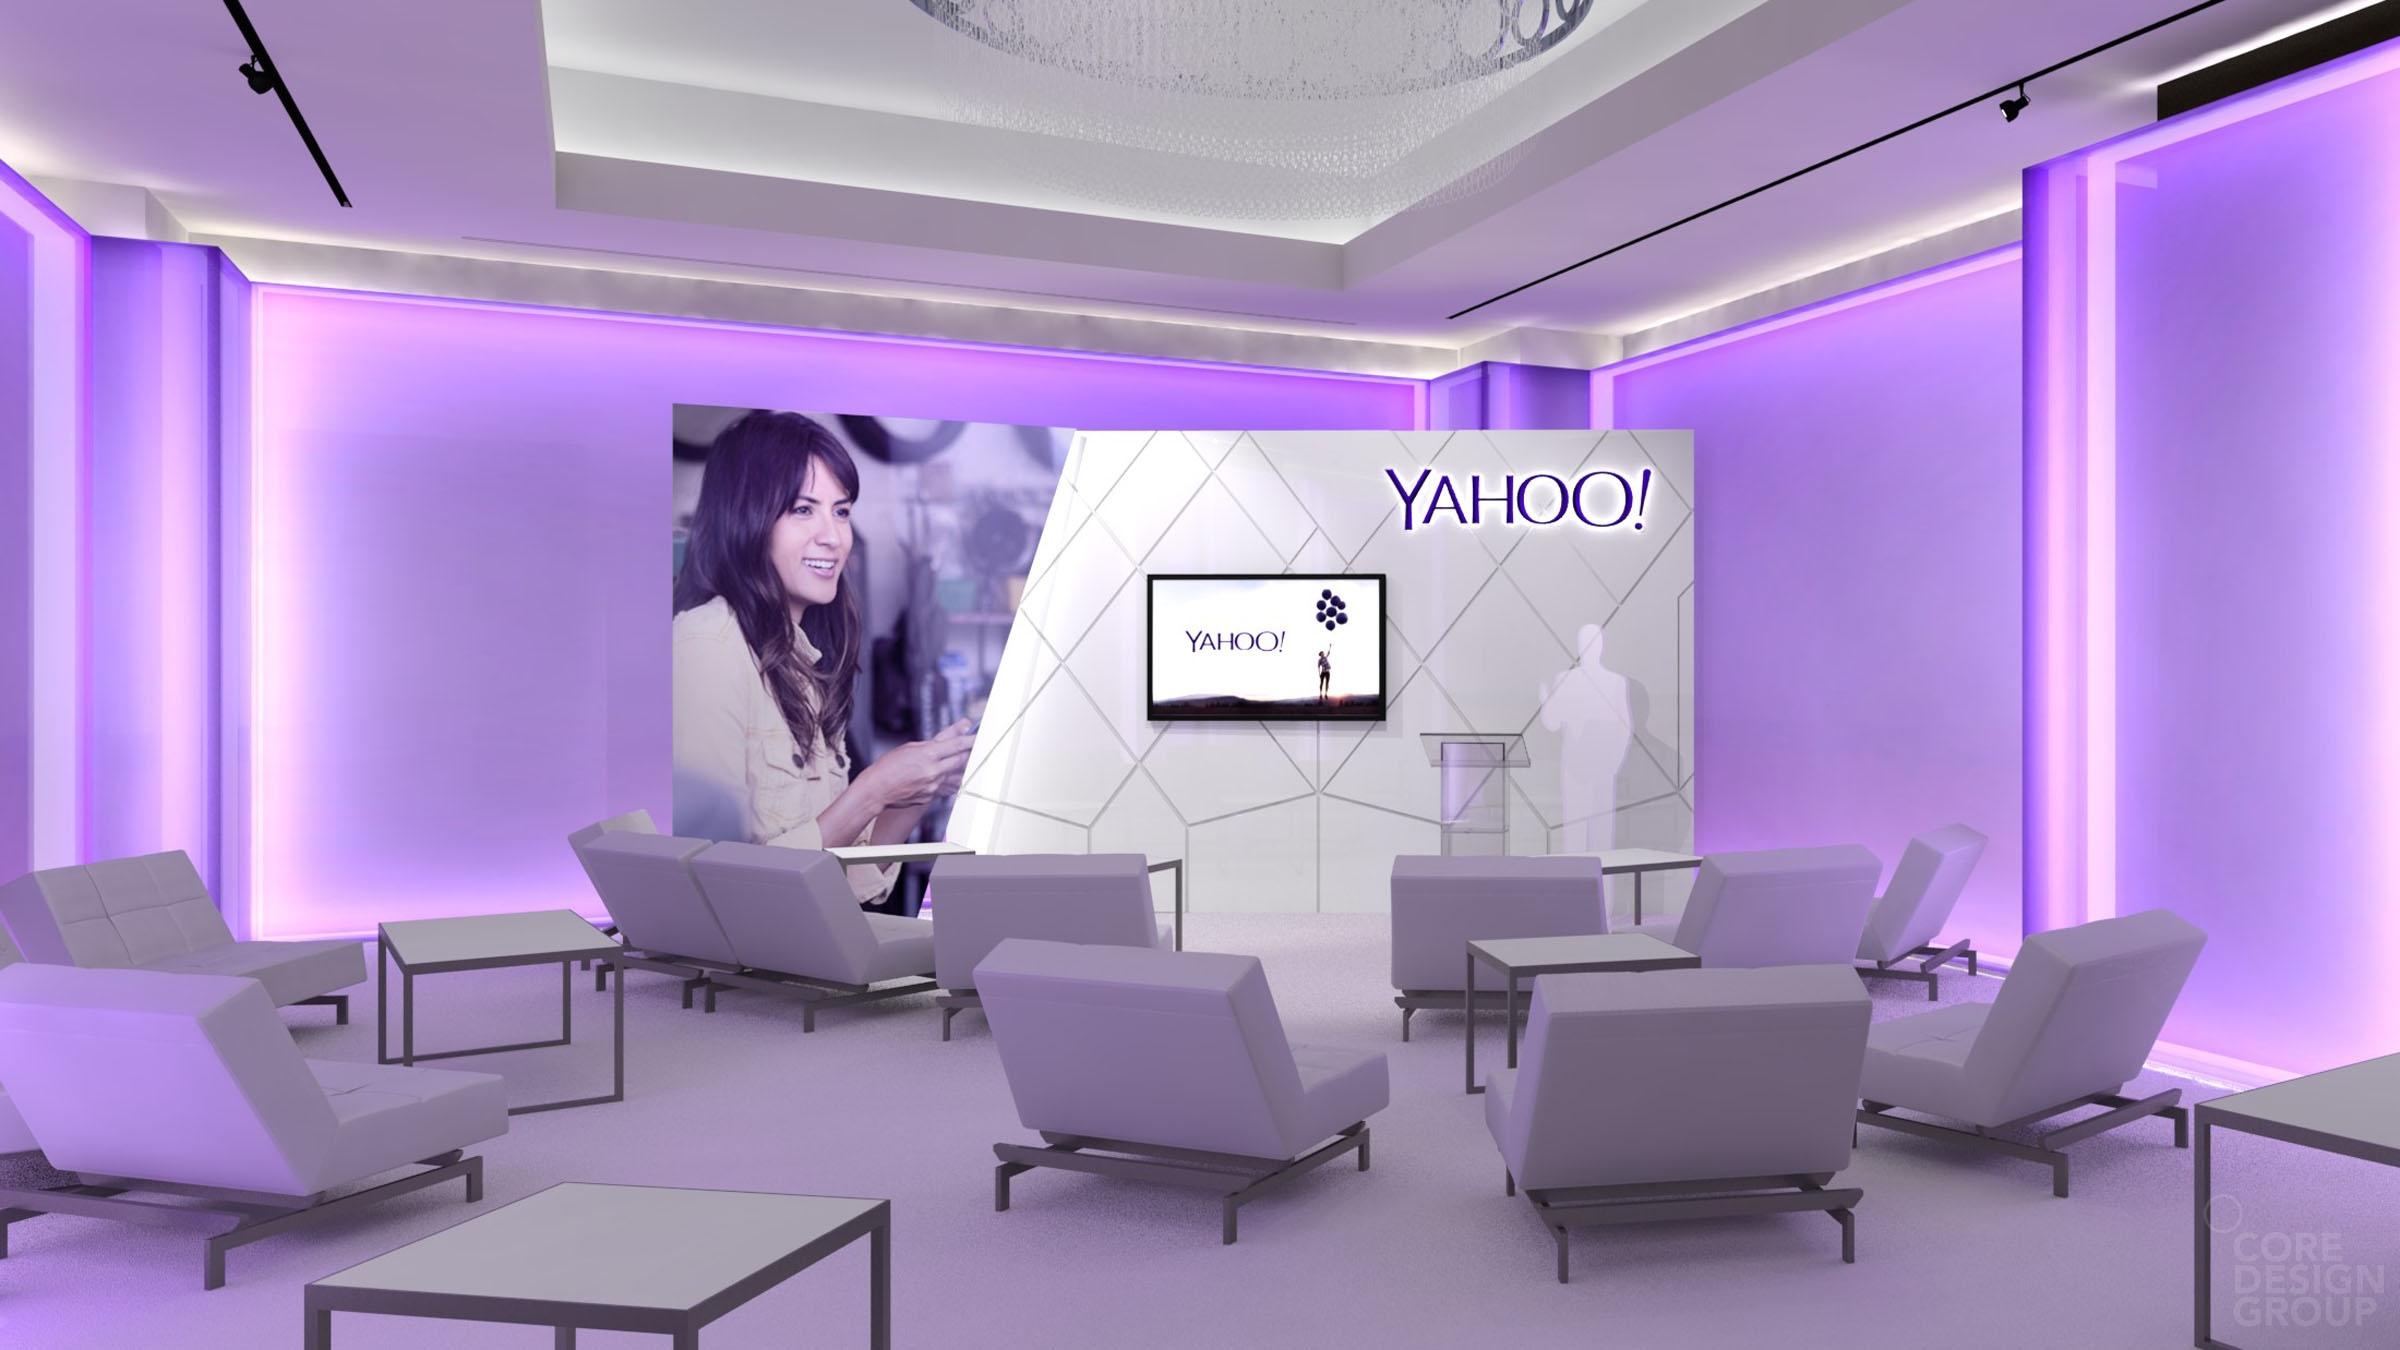 01 Yahoo CES 15 Nolita Mdl2 DemoProduct Demo Vignette2 00